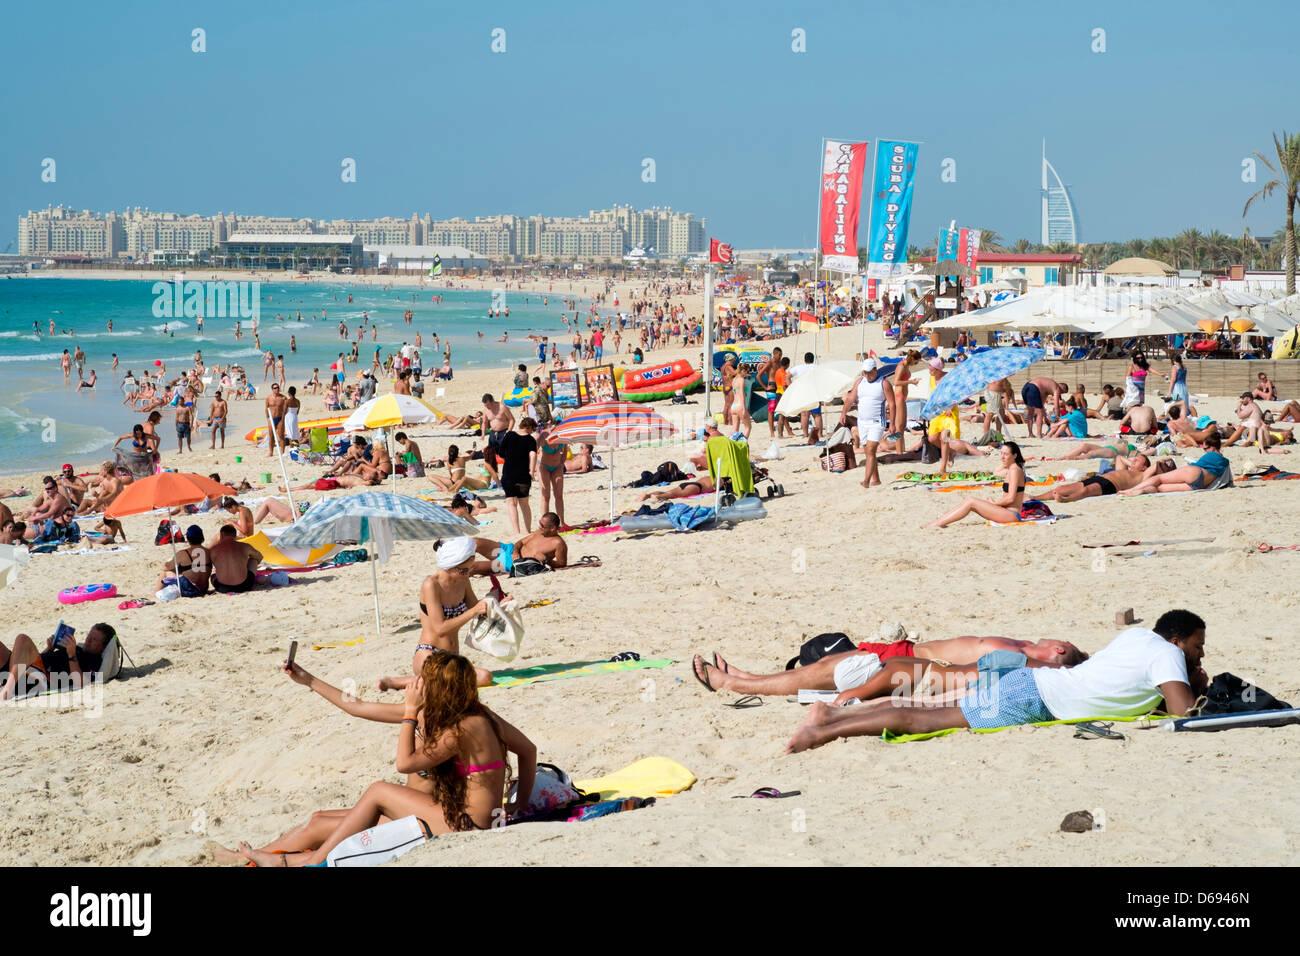 Busy beach near Marina at New Dubai in United Arab Emirates - Stock Image